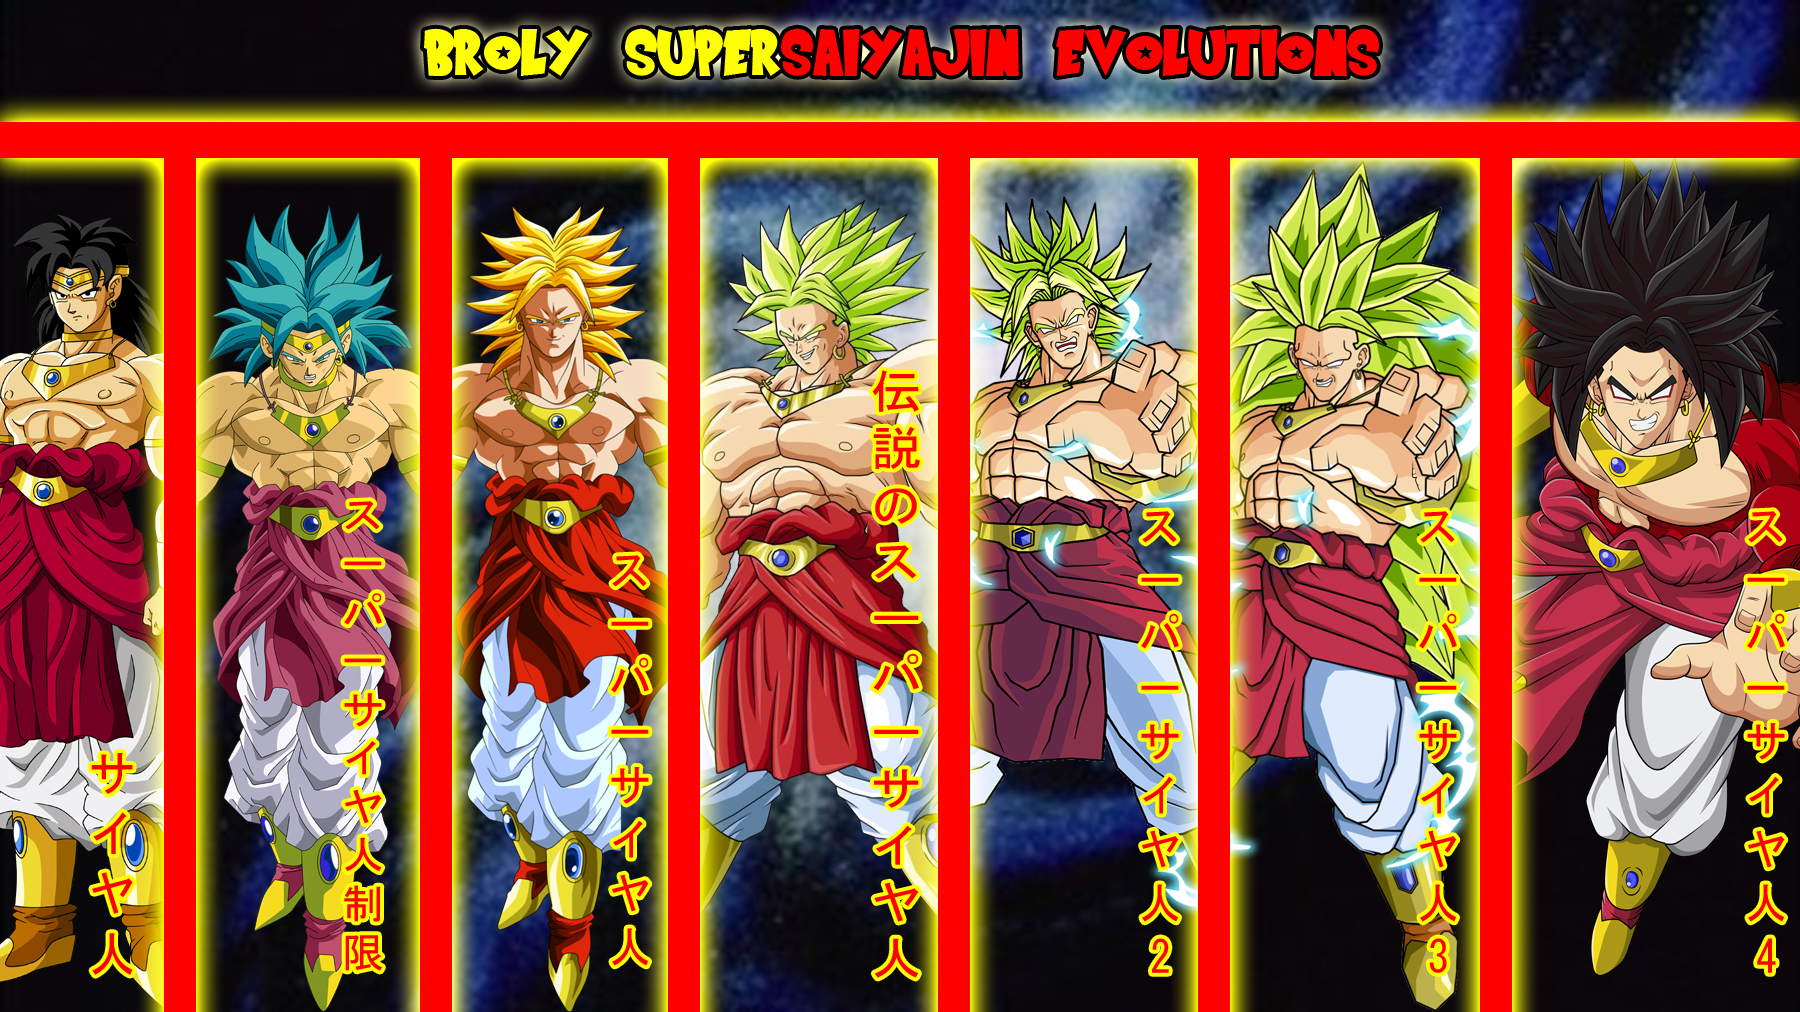 Broly Supersaiyajin Evolutions Wallpaper And Background Image